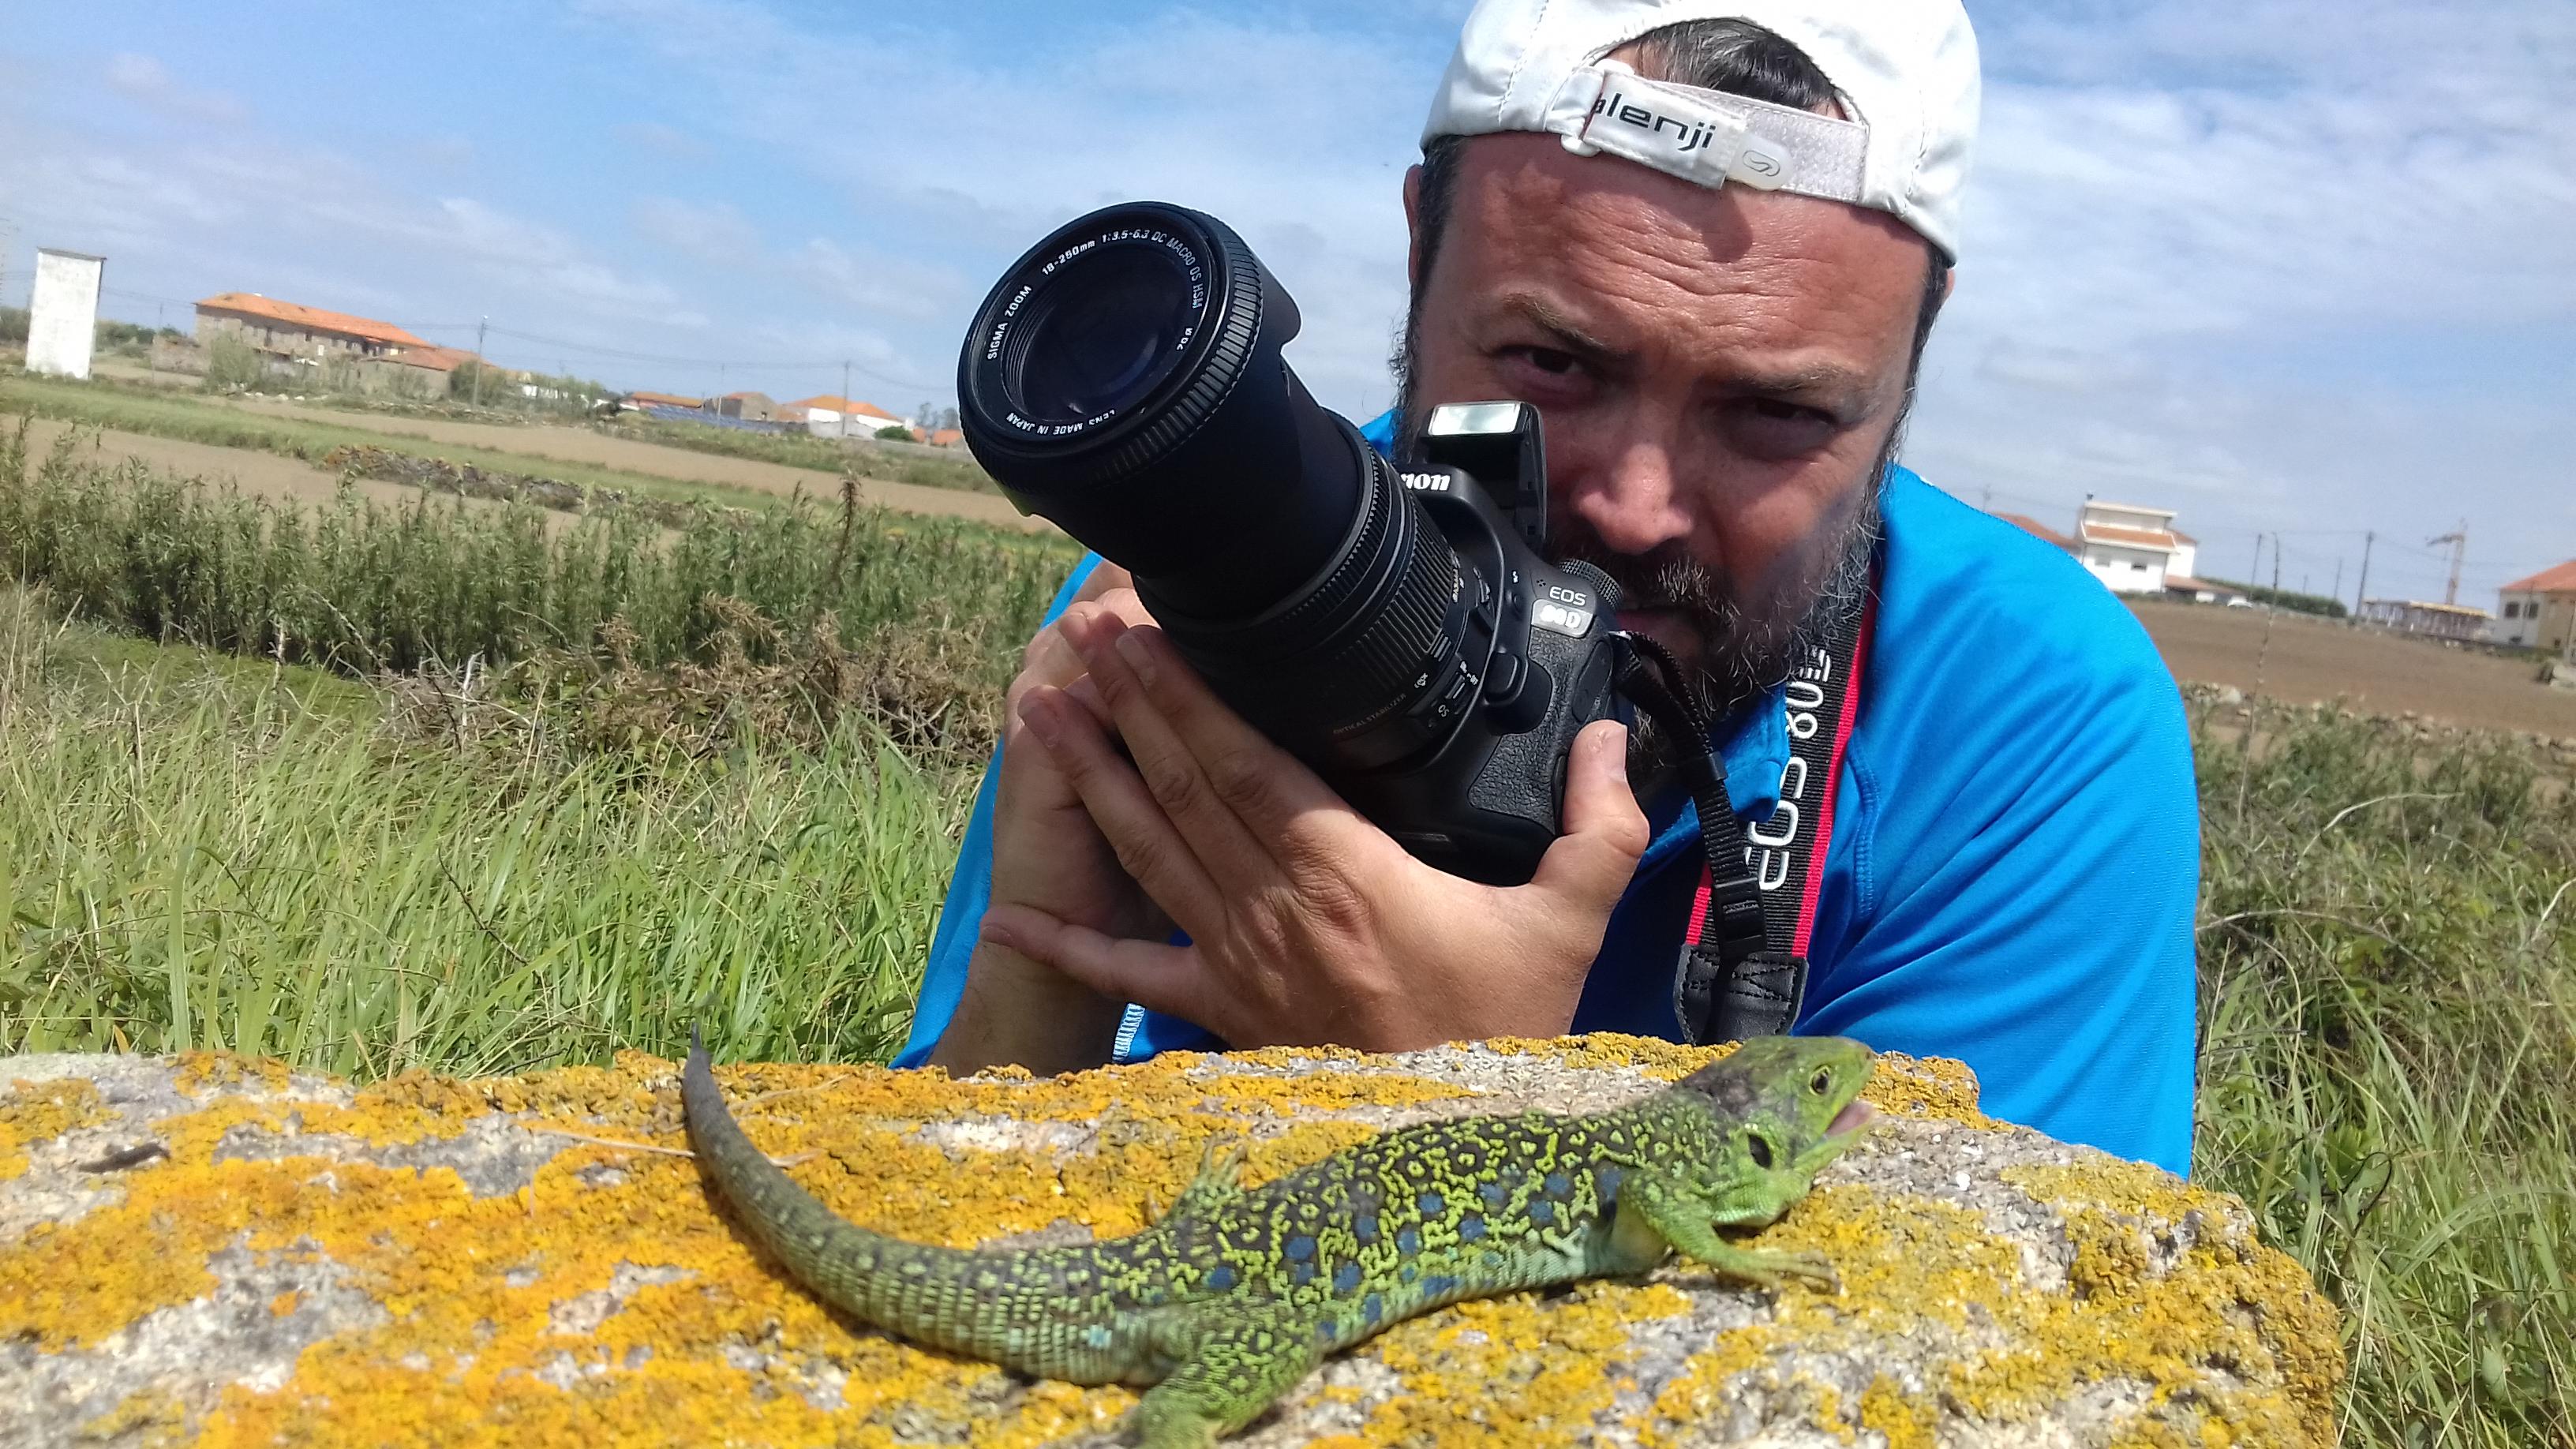 Timon lepidus reptiles de portugal